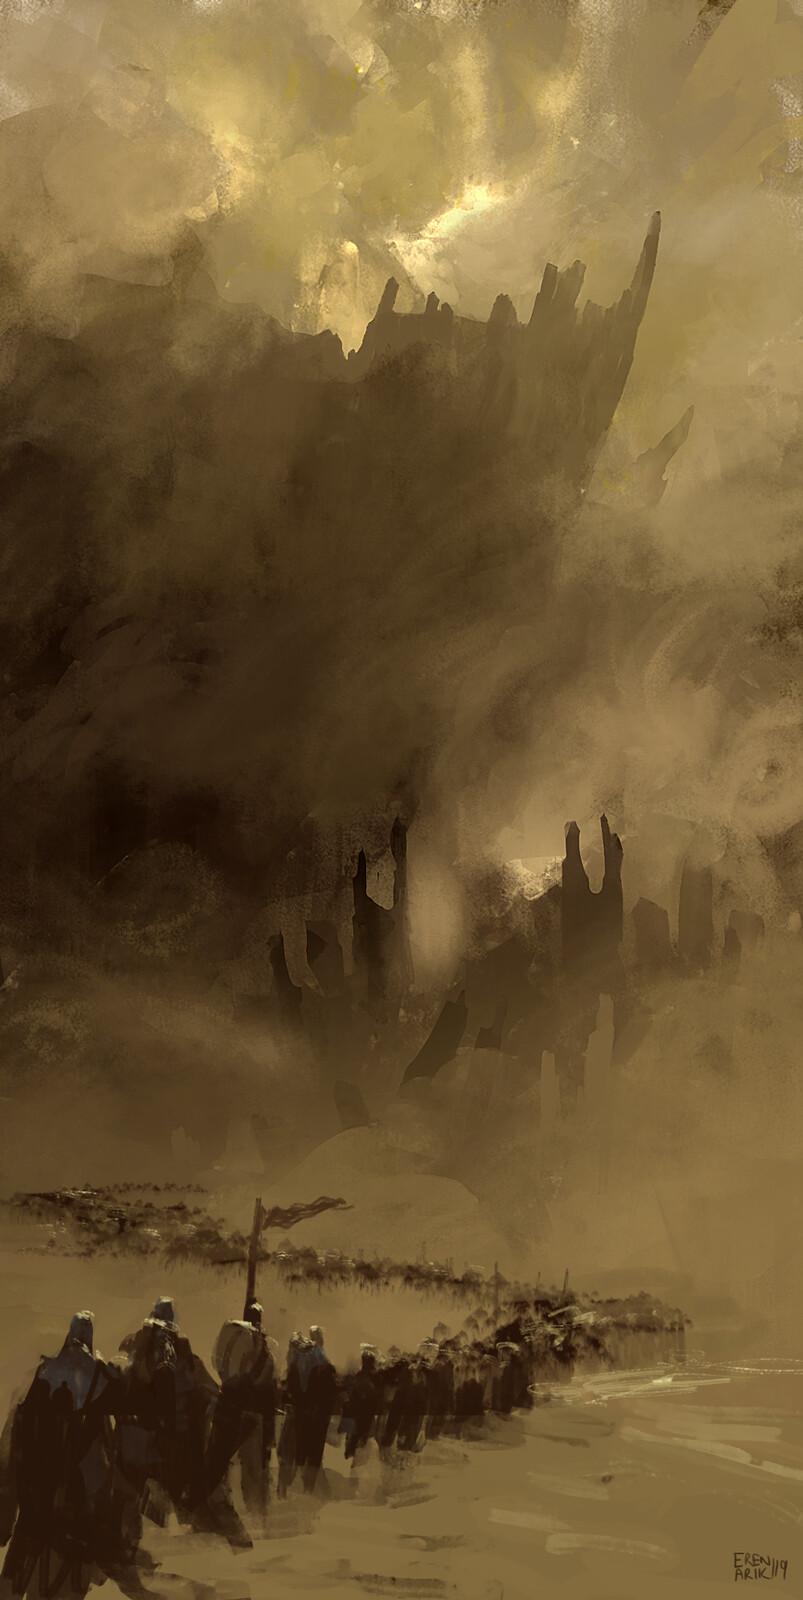 Dustclouds